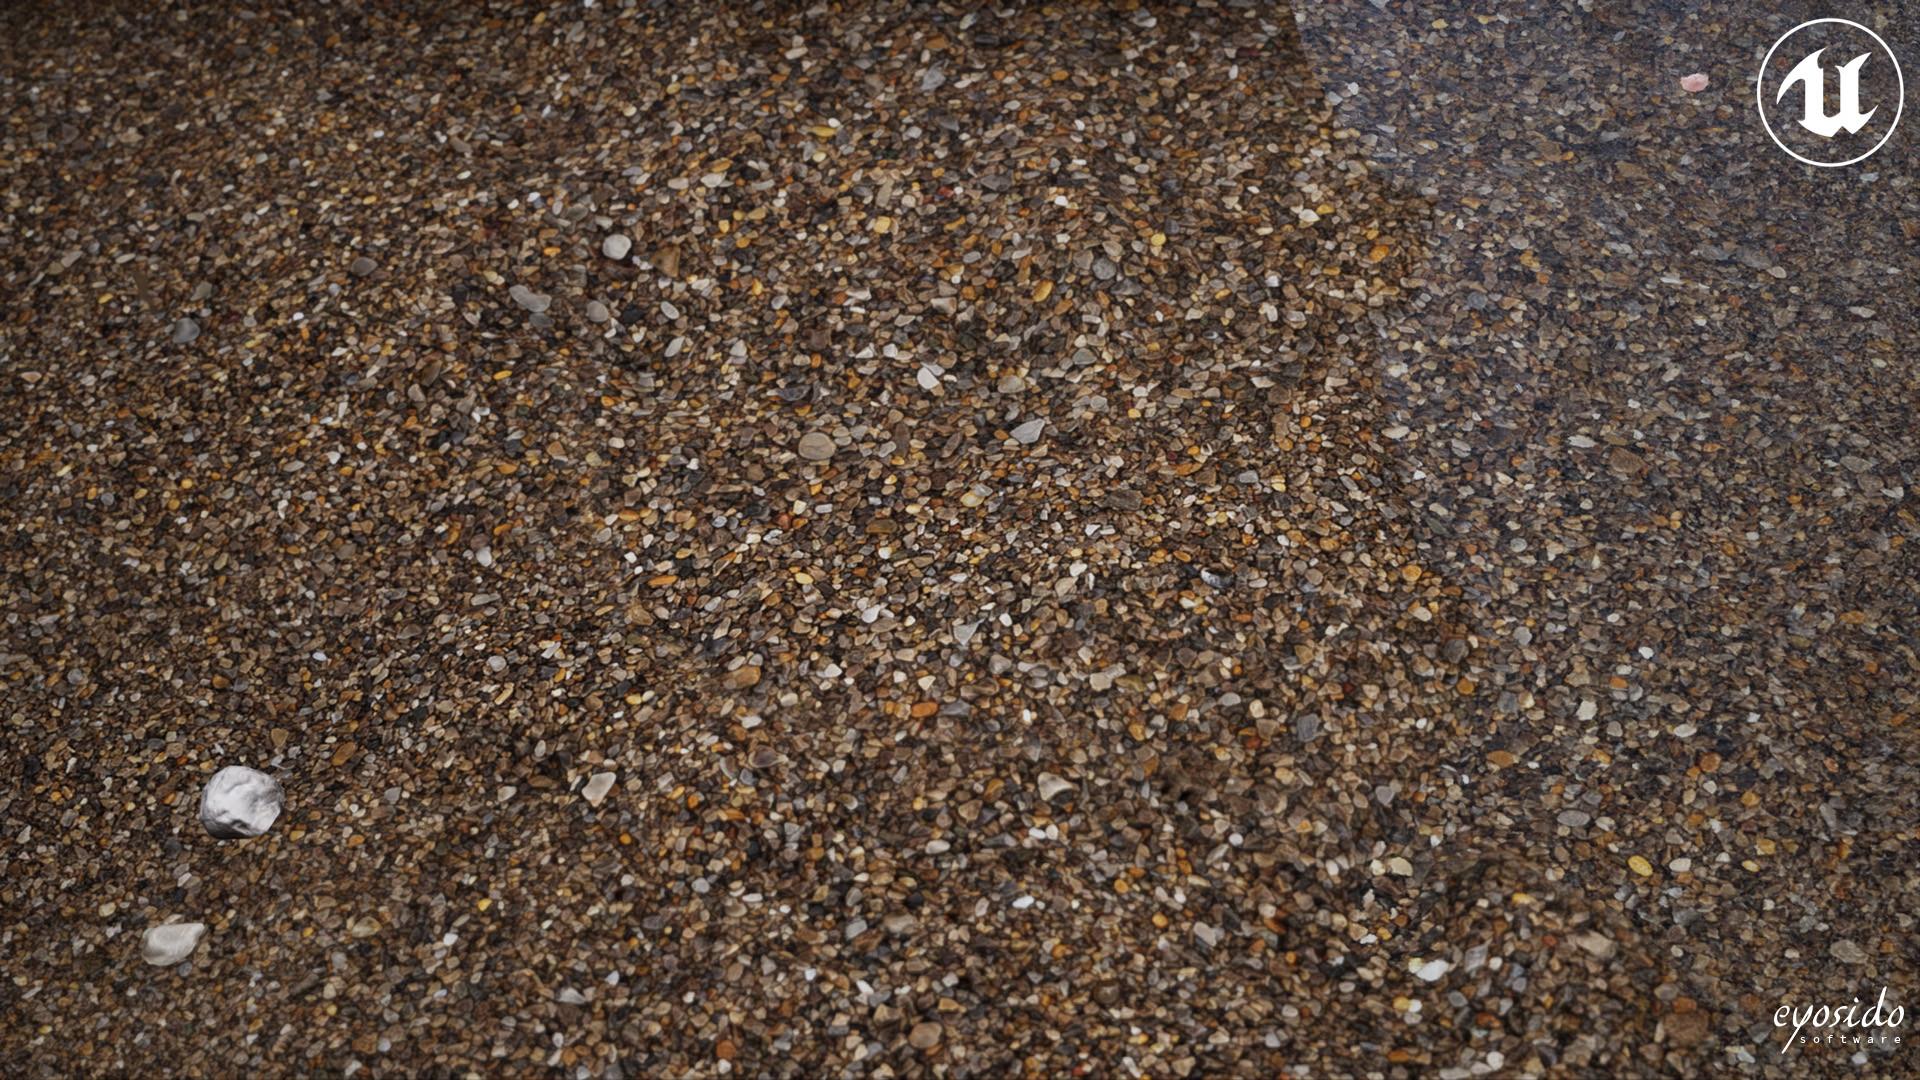 Dark sand on tessellated terrain in UE4 demo scene